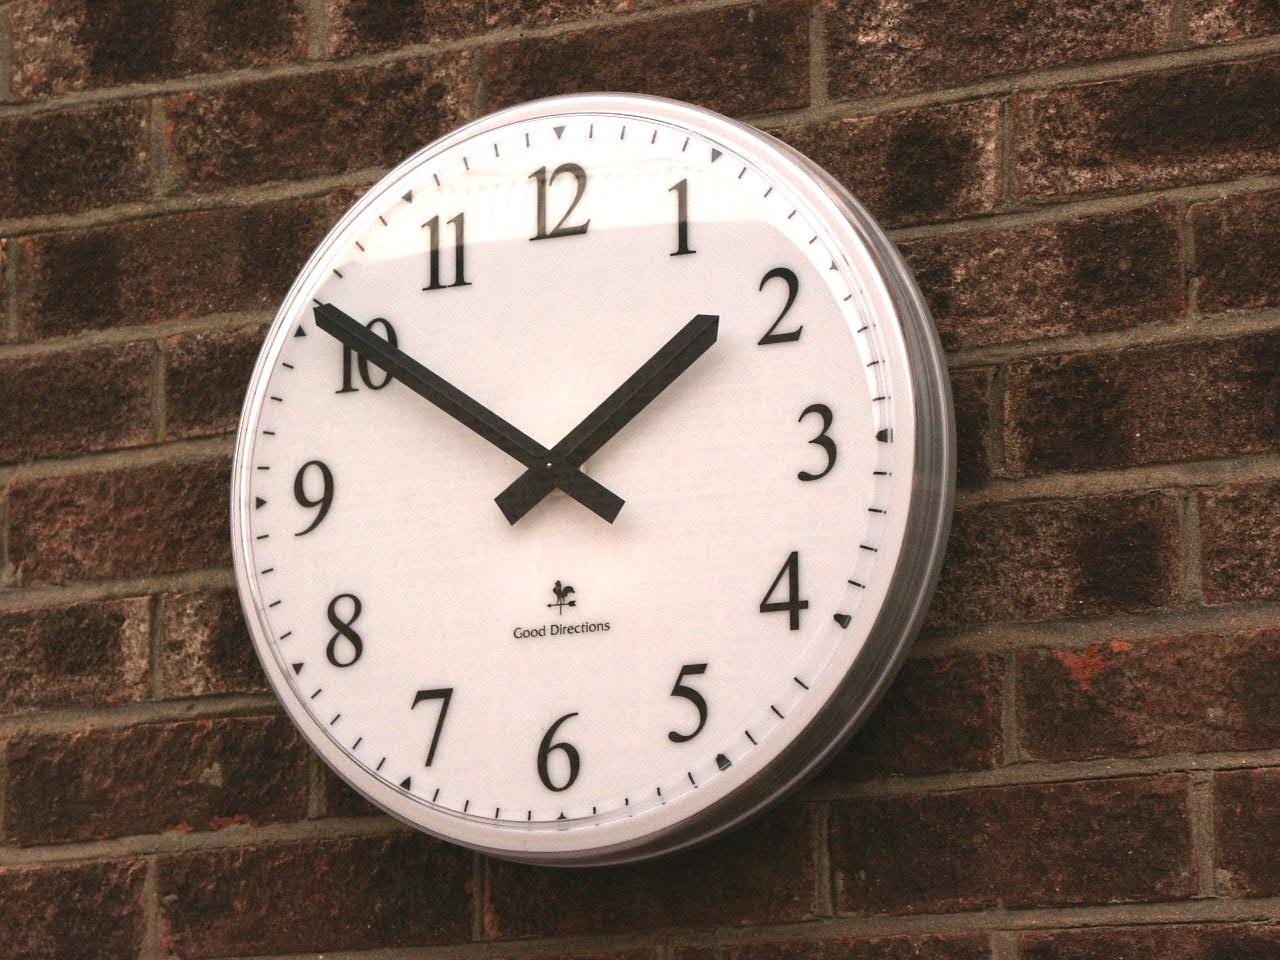 Clock with Arabic numerals